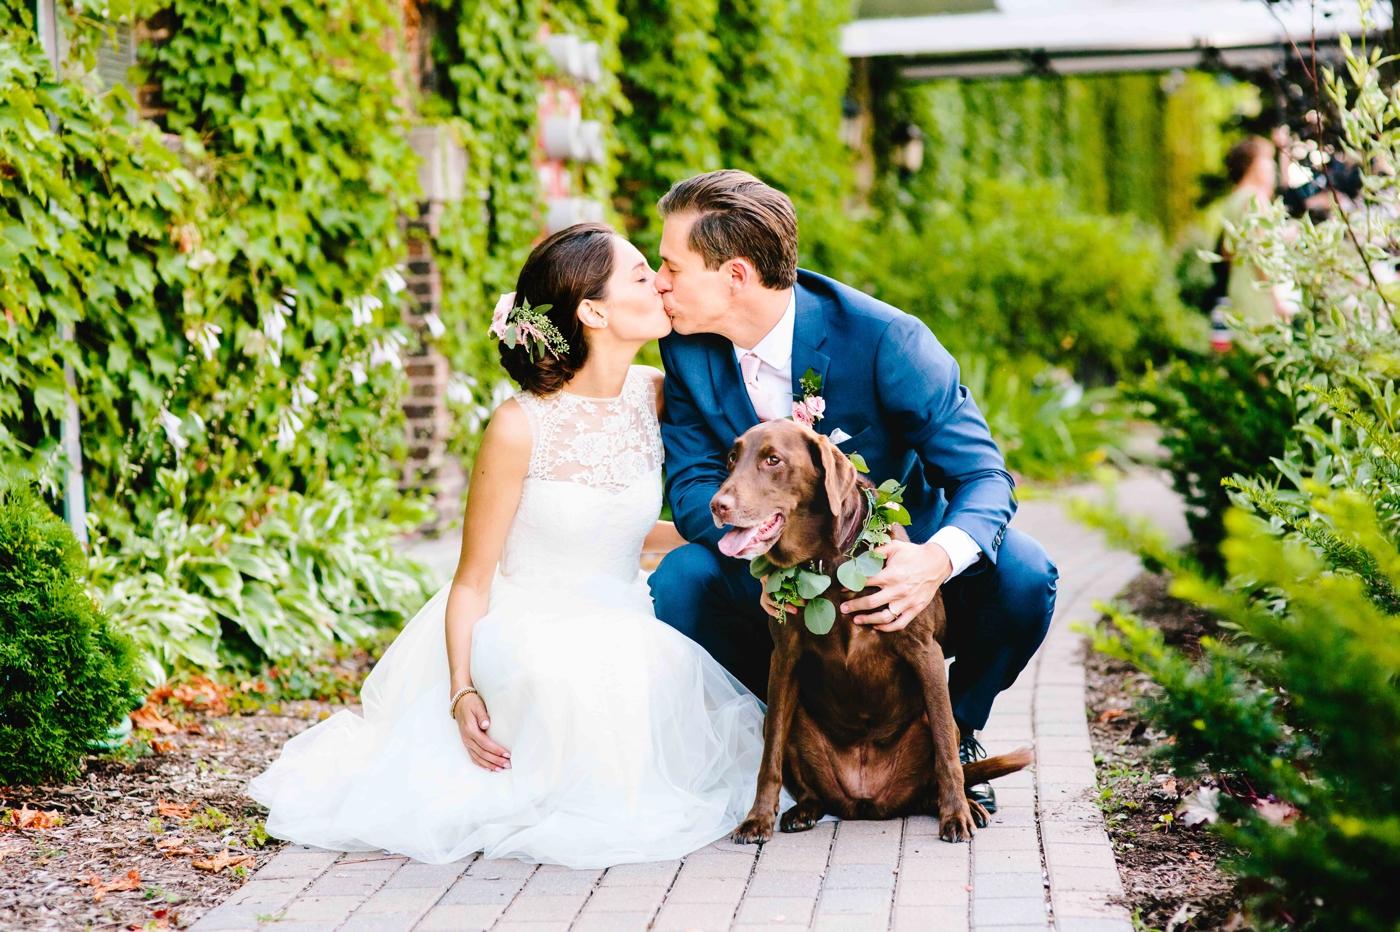 chicago-fine-art-wedding-photography-tyma40